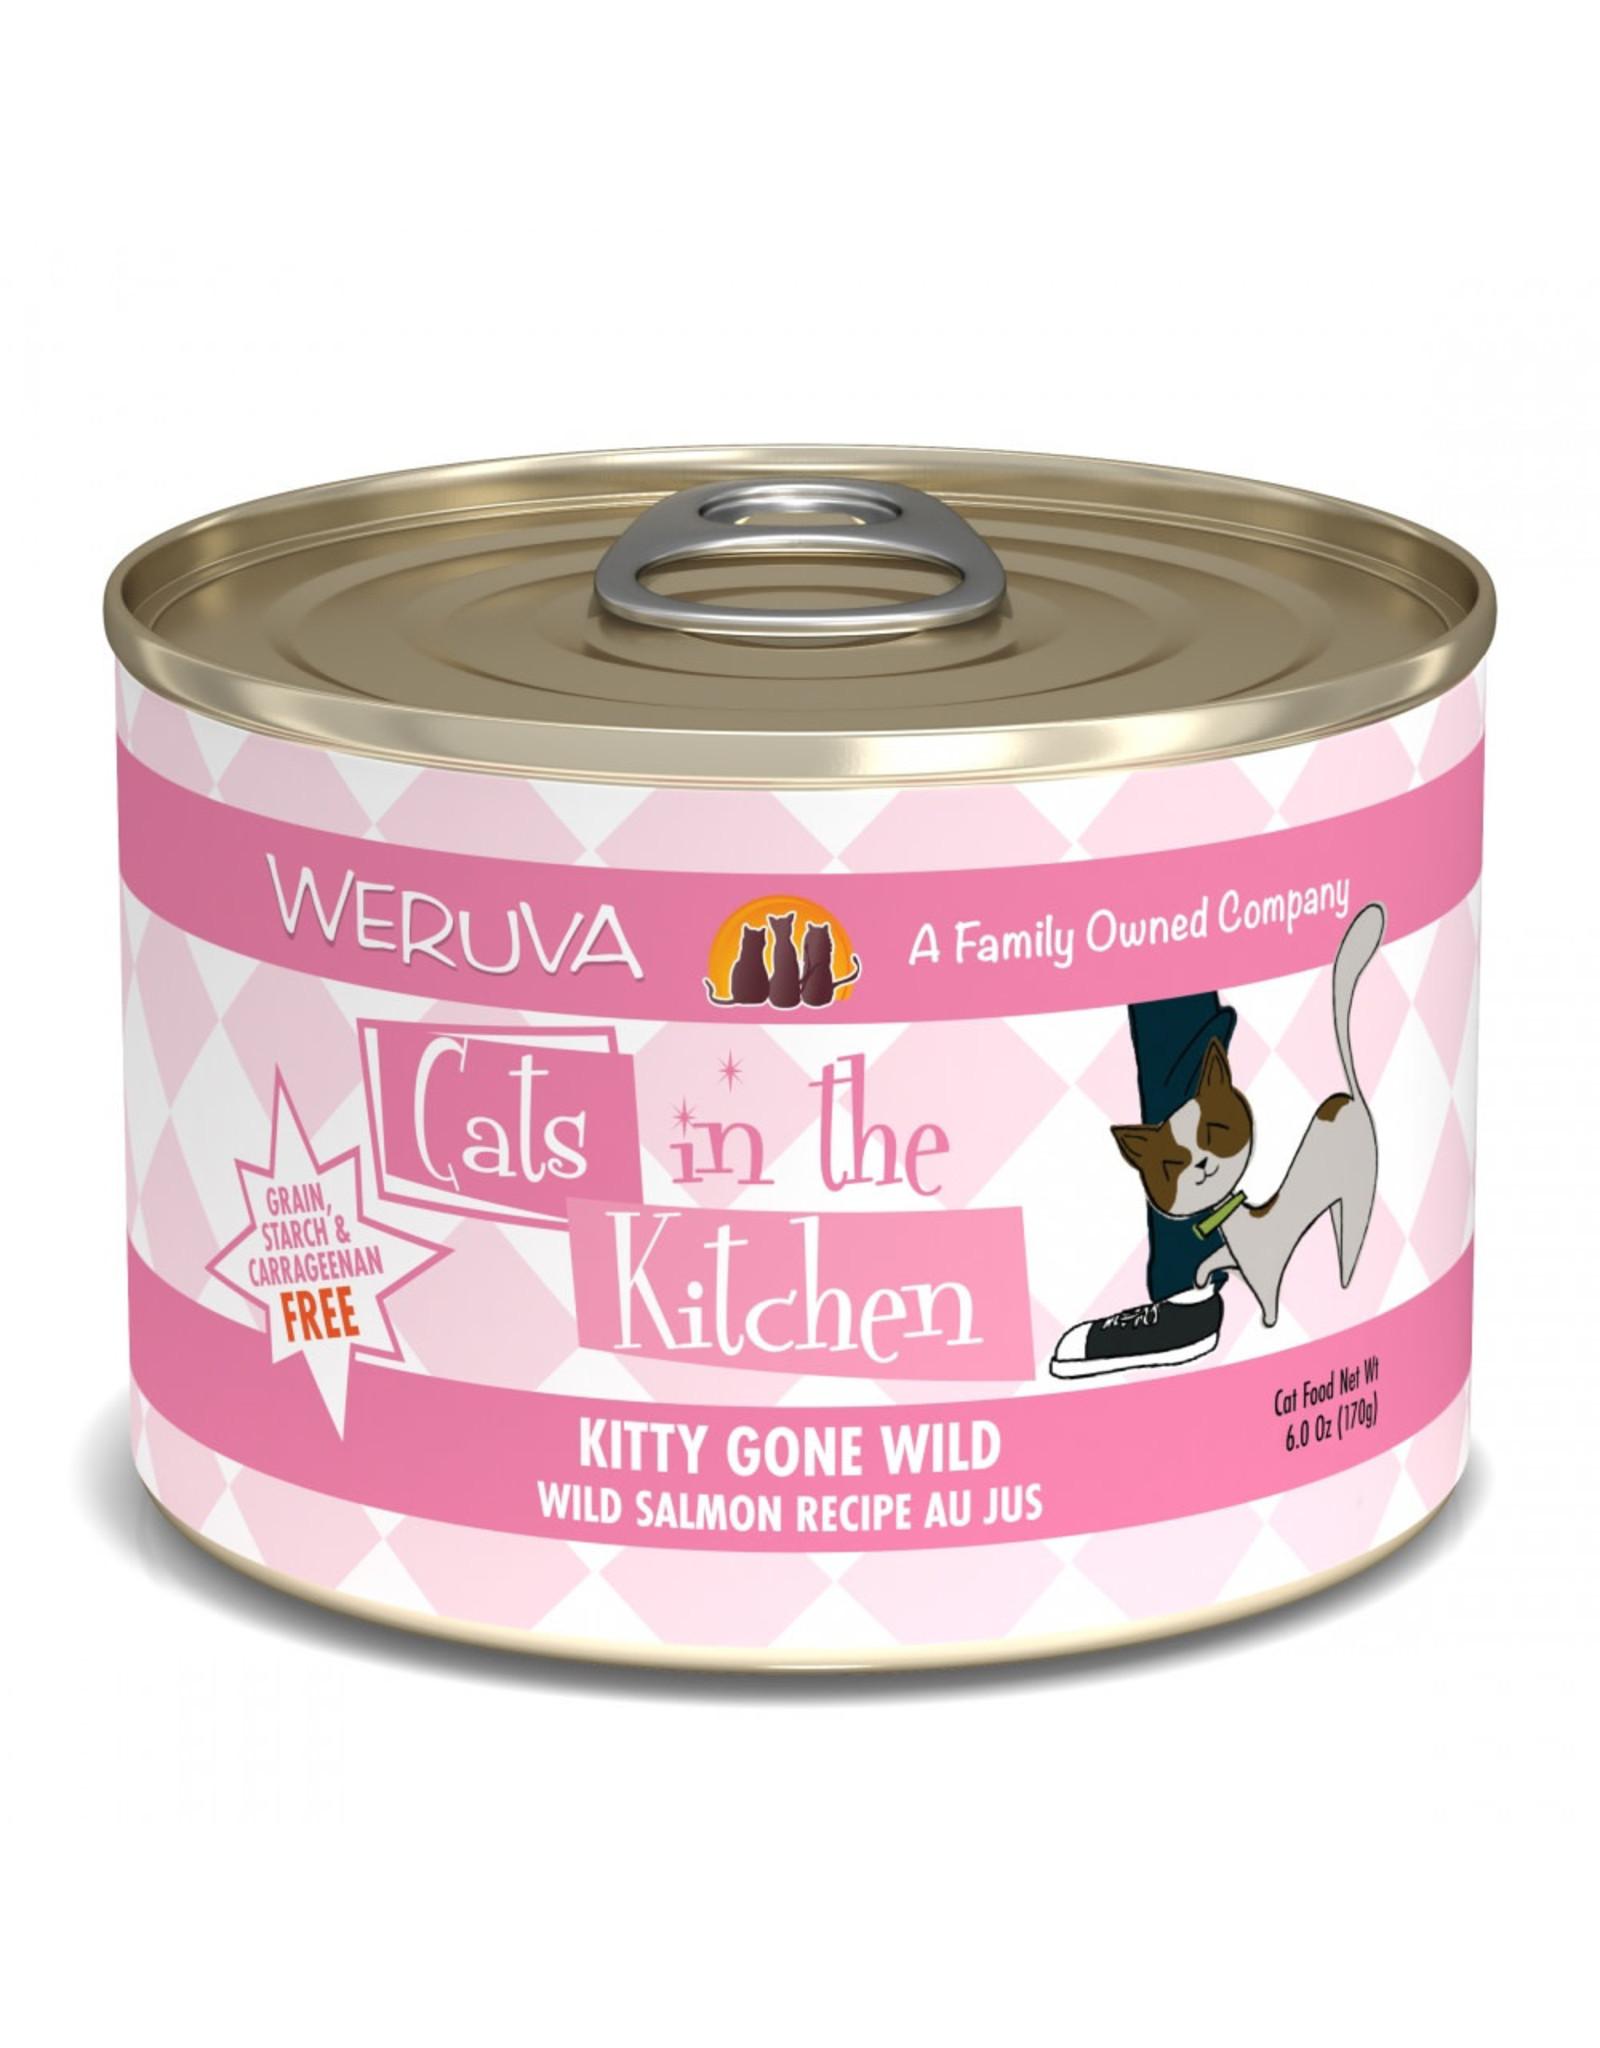 Weruva CITK Kitty Gone Wild 6oz